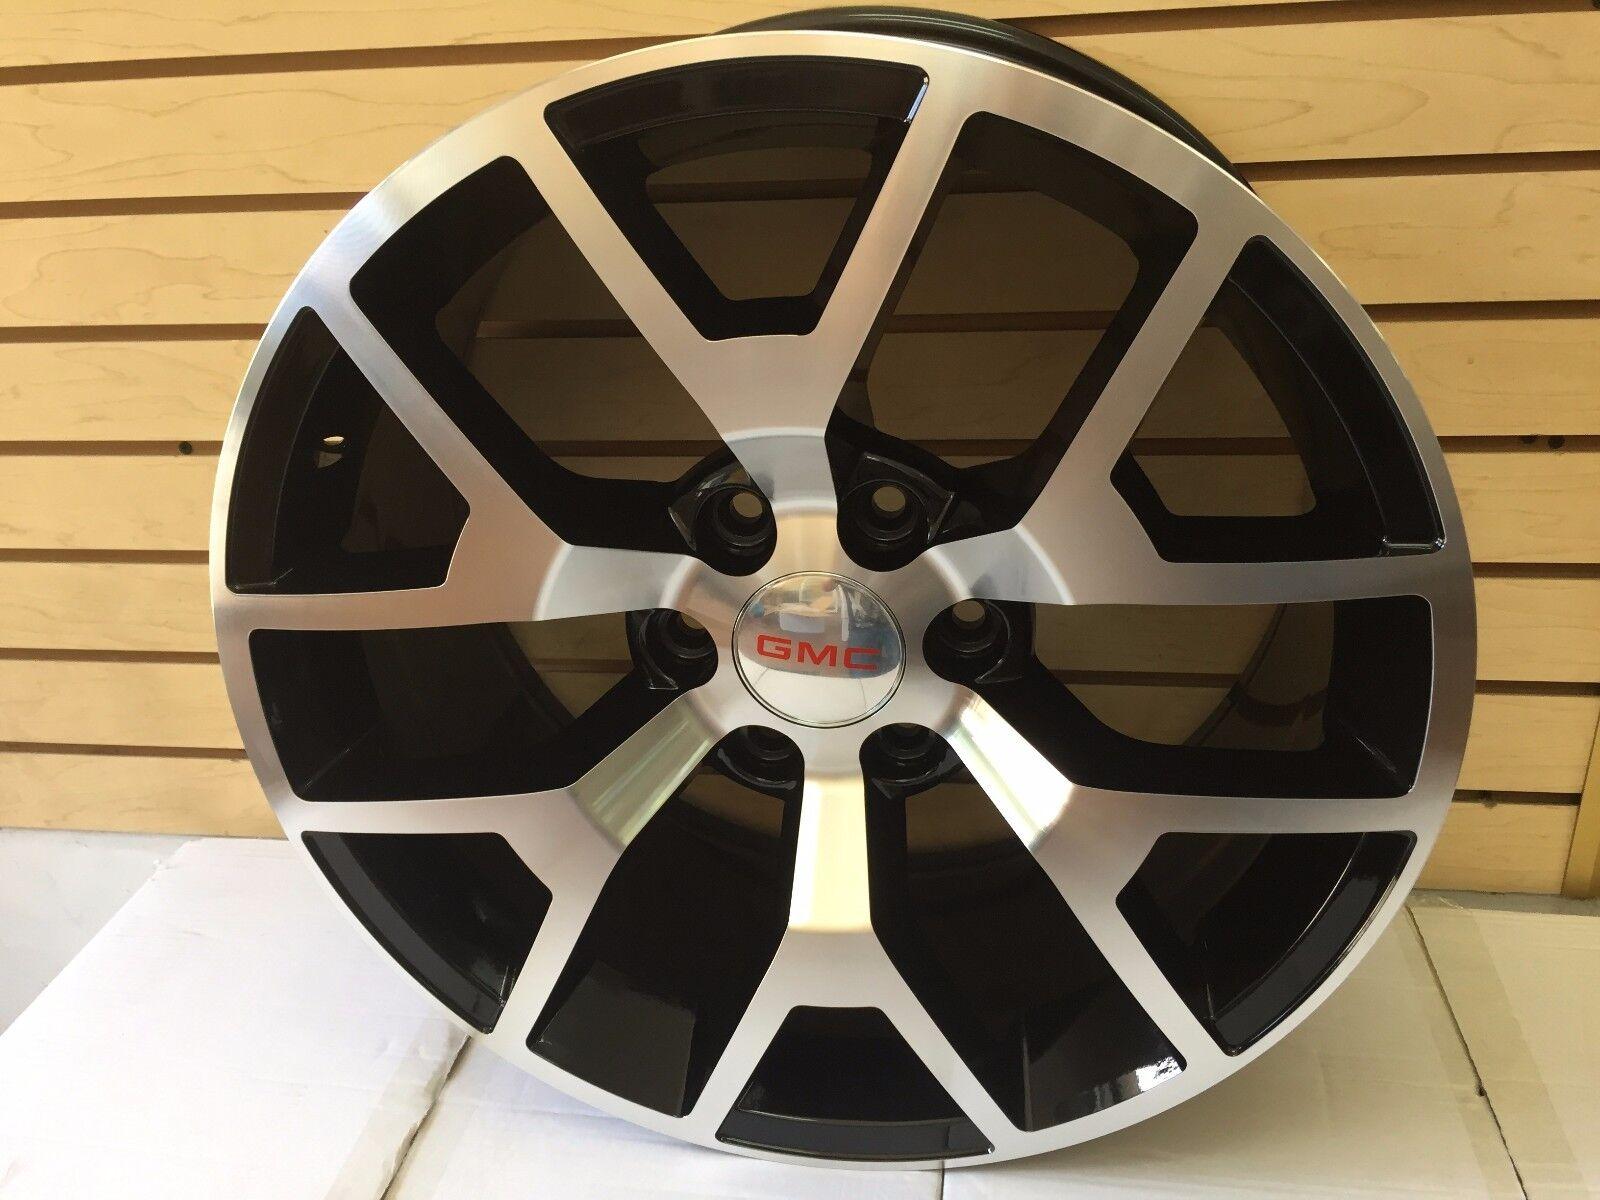 20 Inch GMC Black and Machined Wheels Rims Sierra Z71 Yukon SLT